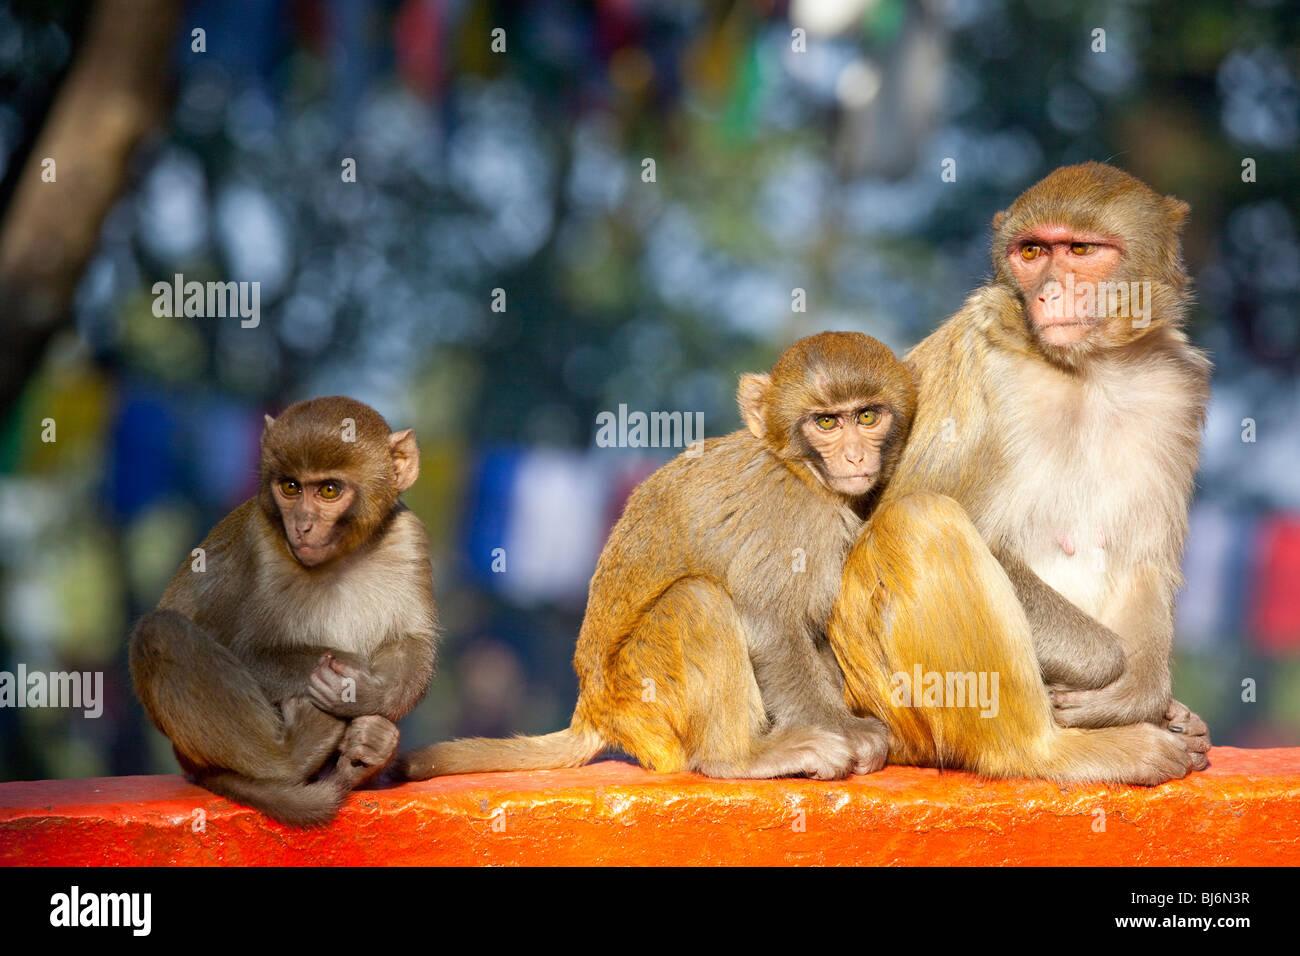 Macaques monkeys in Darjeeling, India - Stock Image